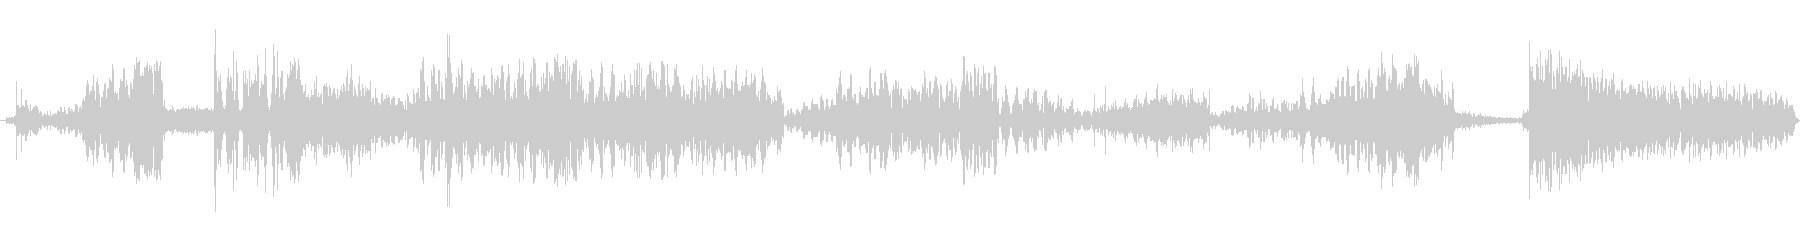 SciFi EC01_88_2の未再生の波形